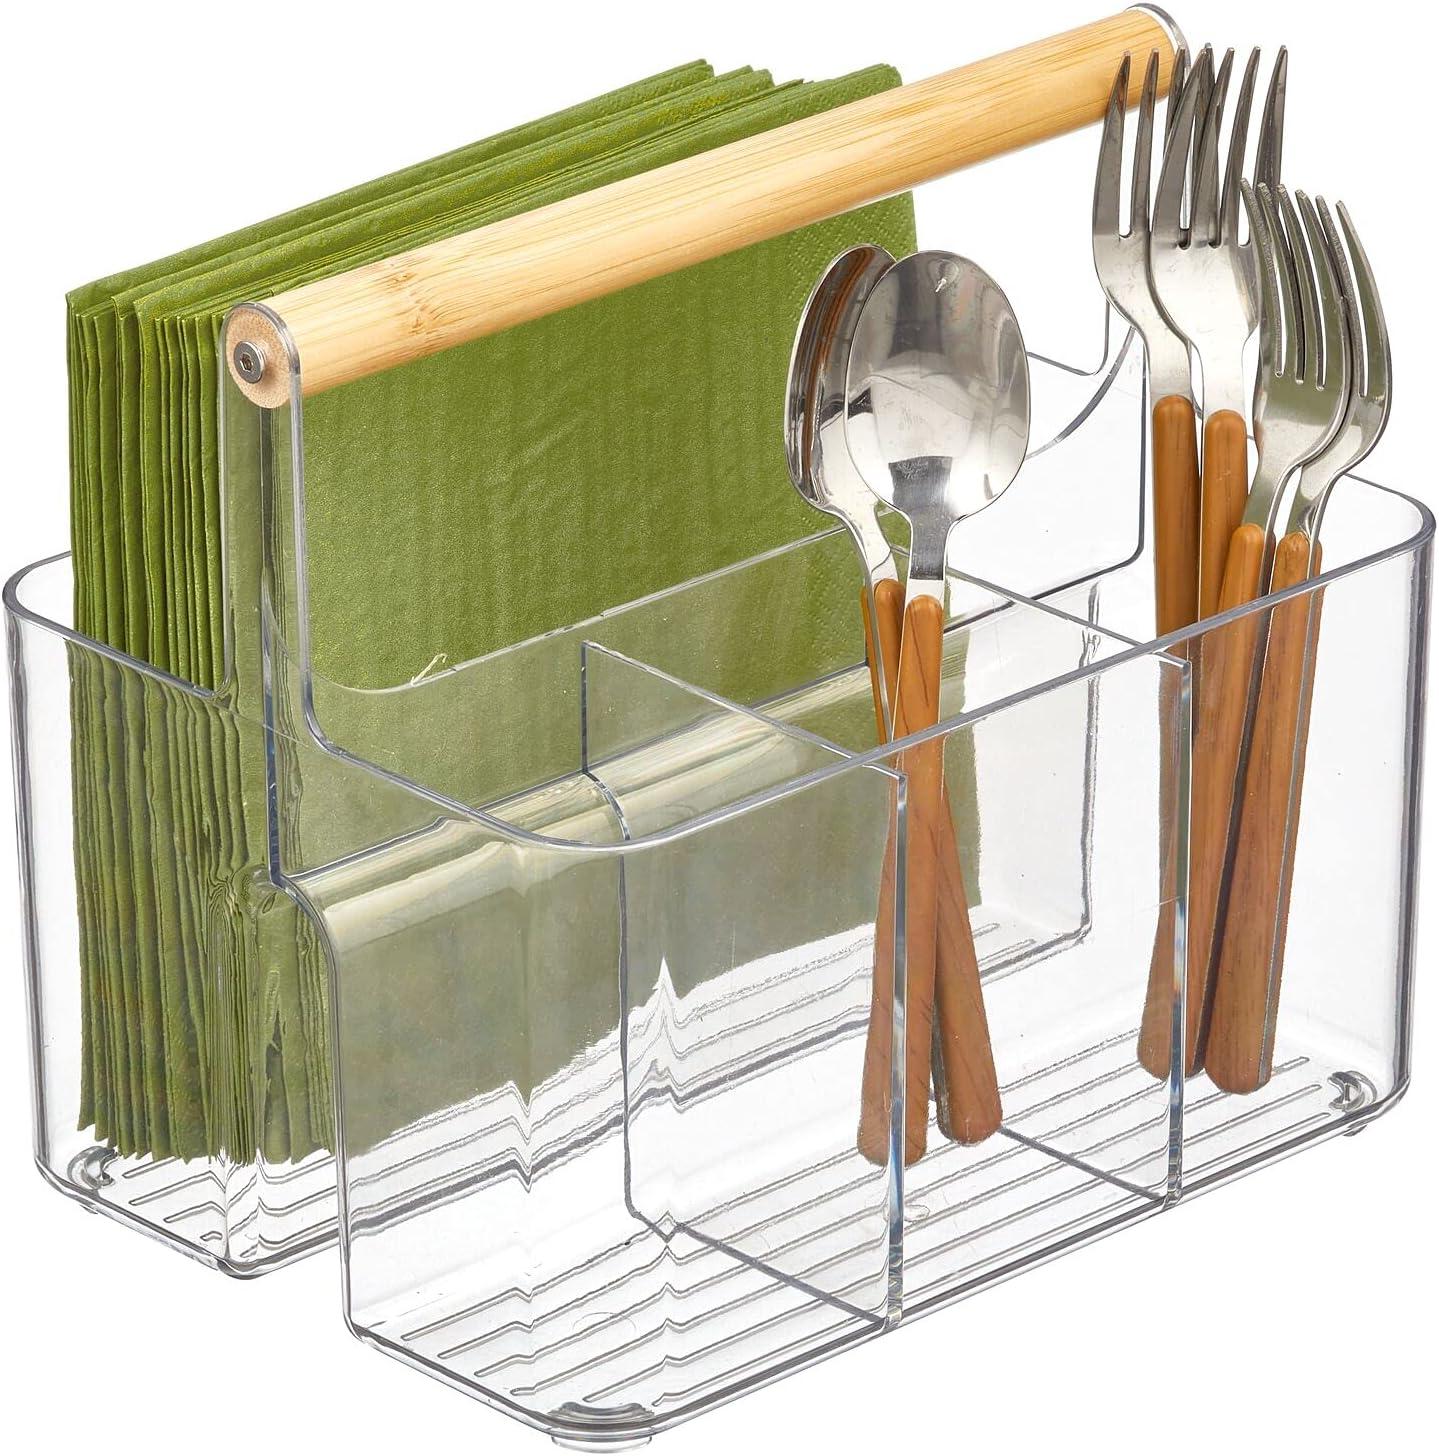 mDesign Portable Kitchen Caddy Tote El Max 77% OFF Paso Mall Storage Divided Organizer B